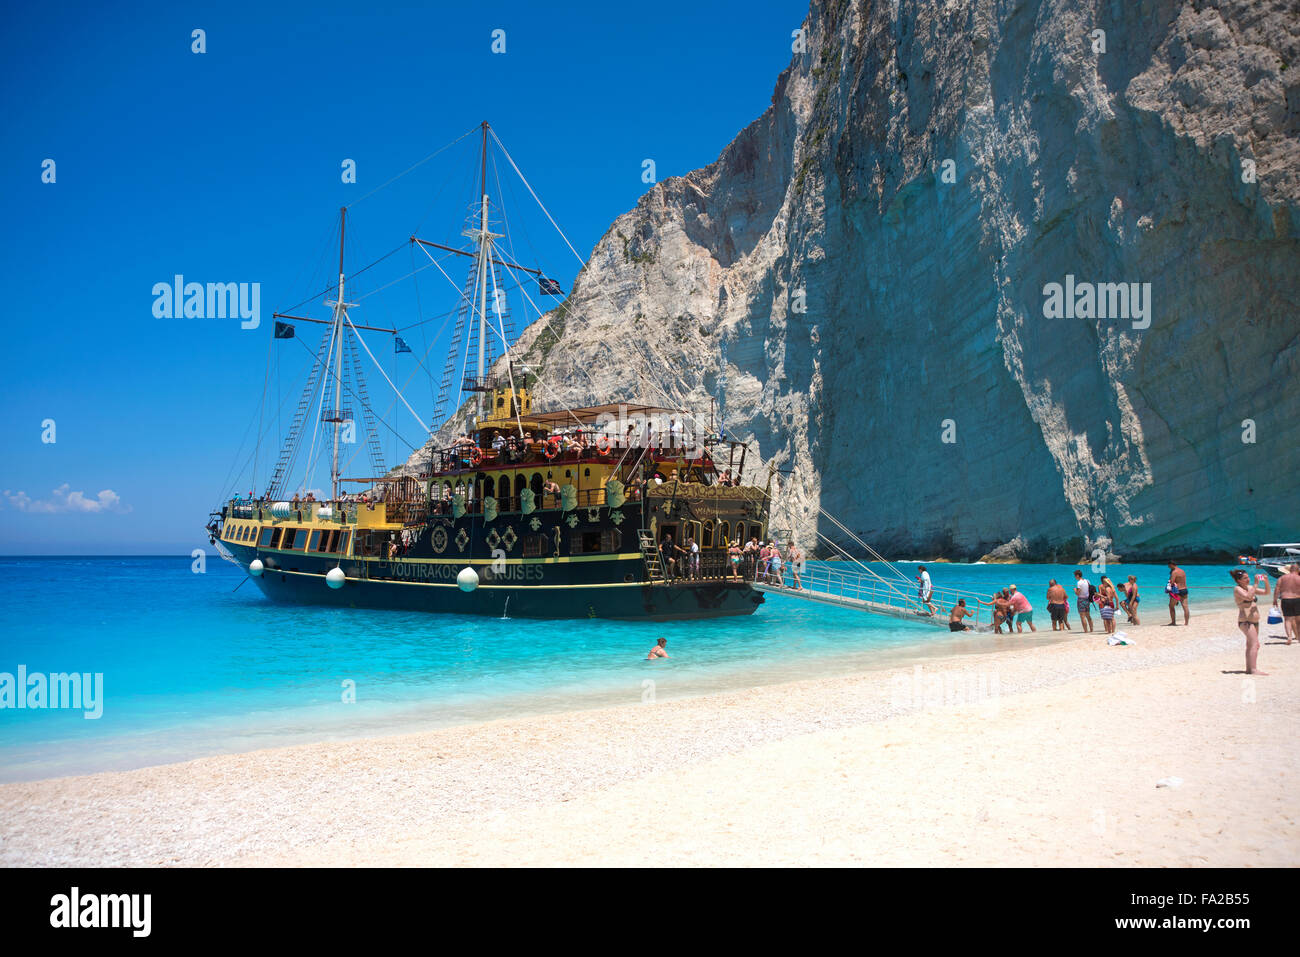 Island Beach Pirate Ship